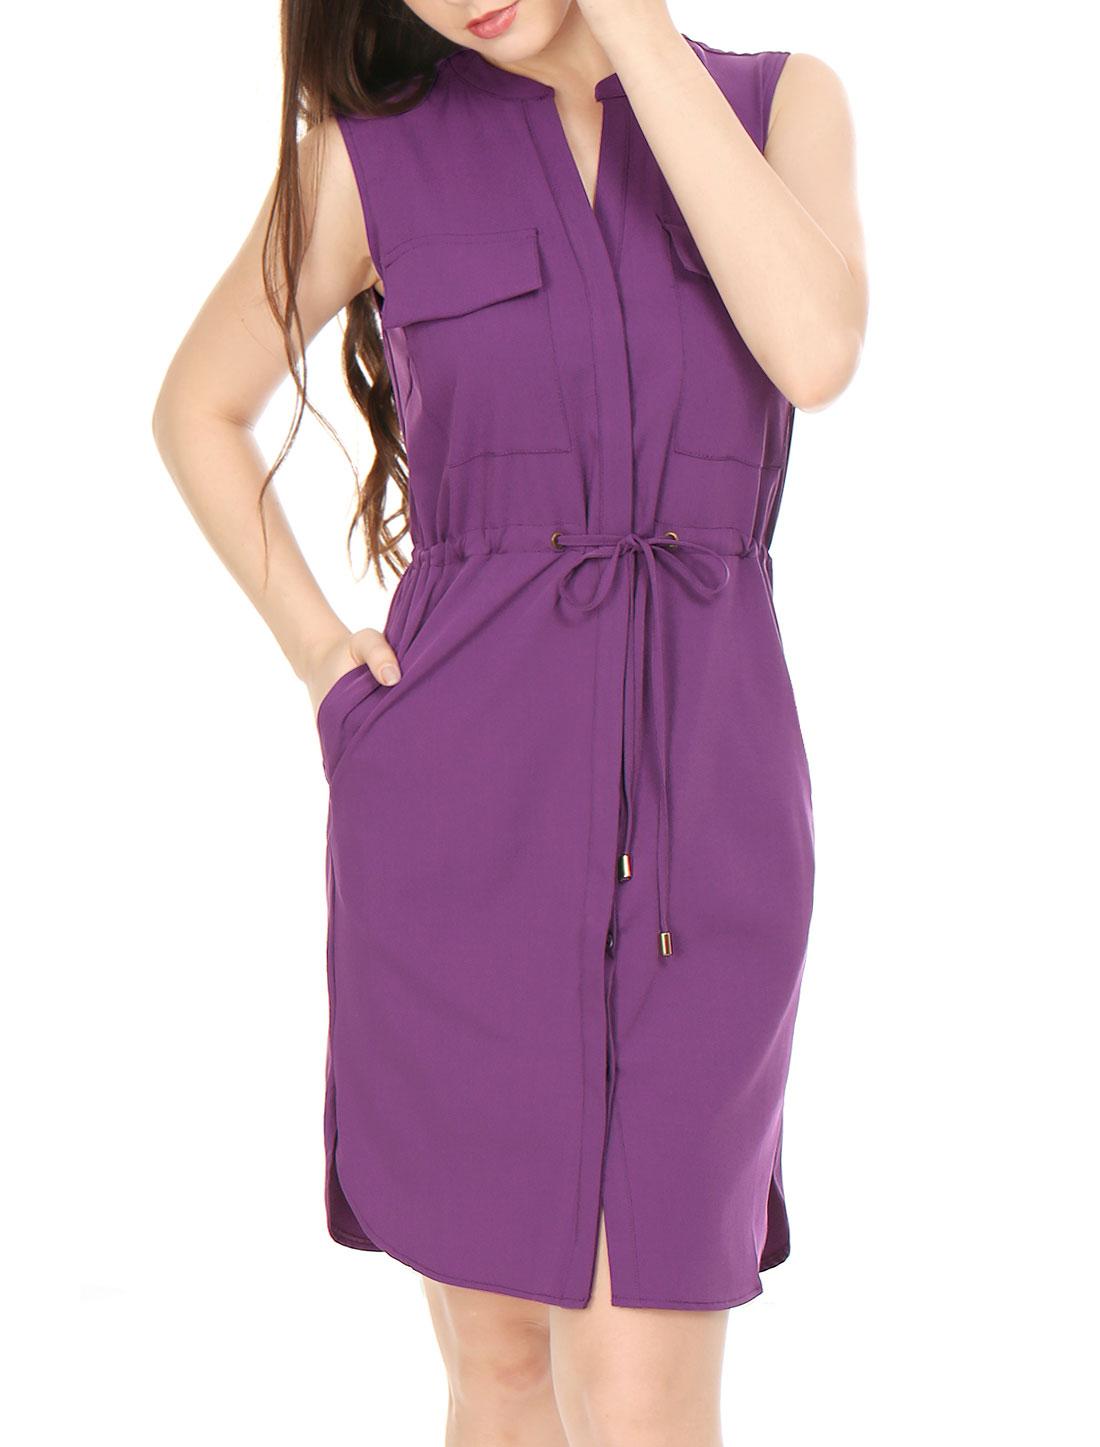 Allegra K Woman Single Breasted Drawstring Sleeveless Dress Purple XL